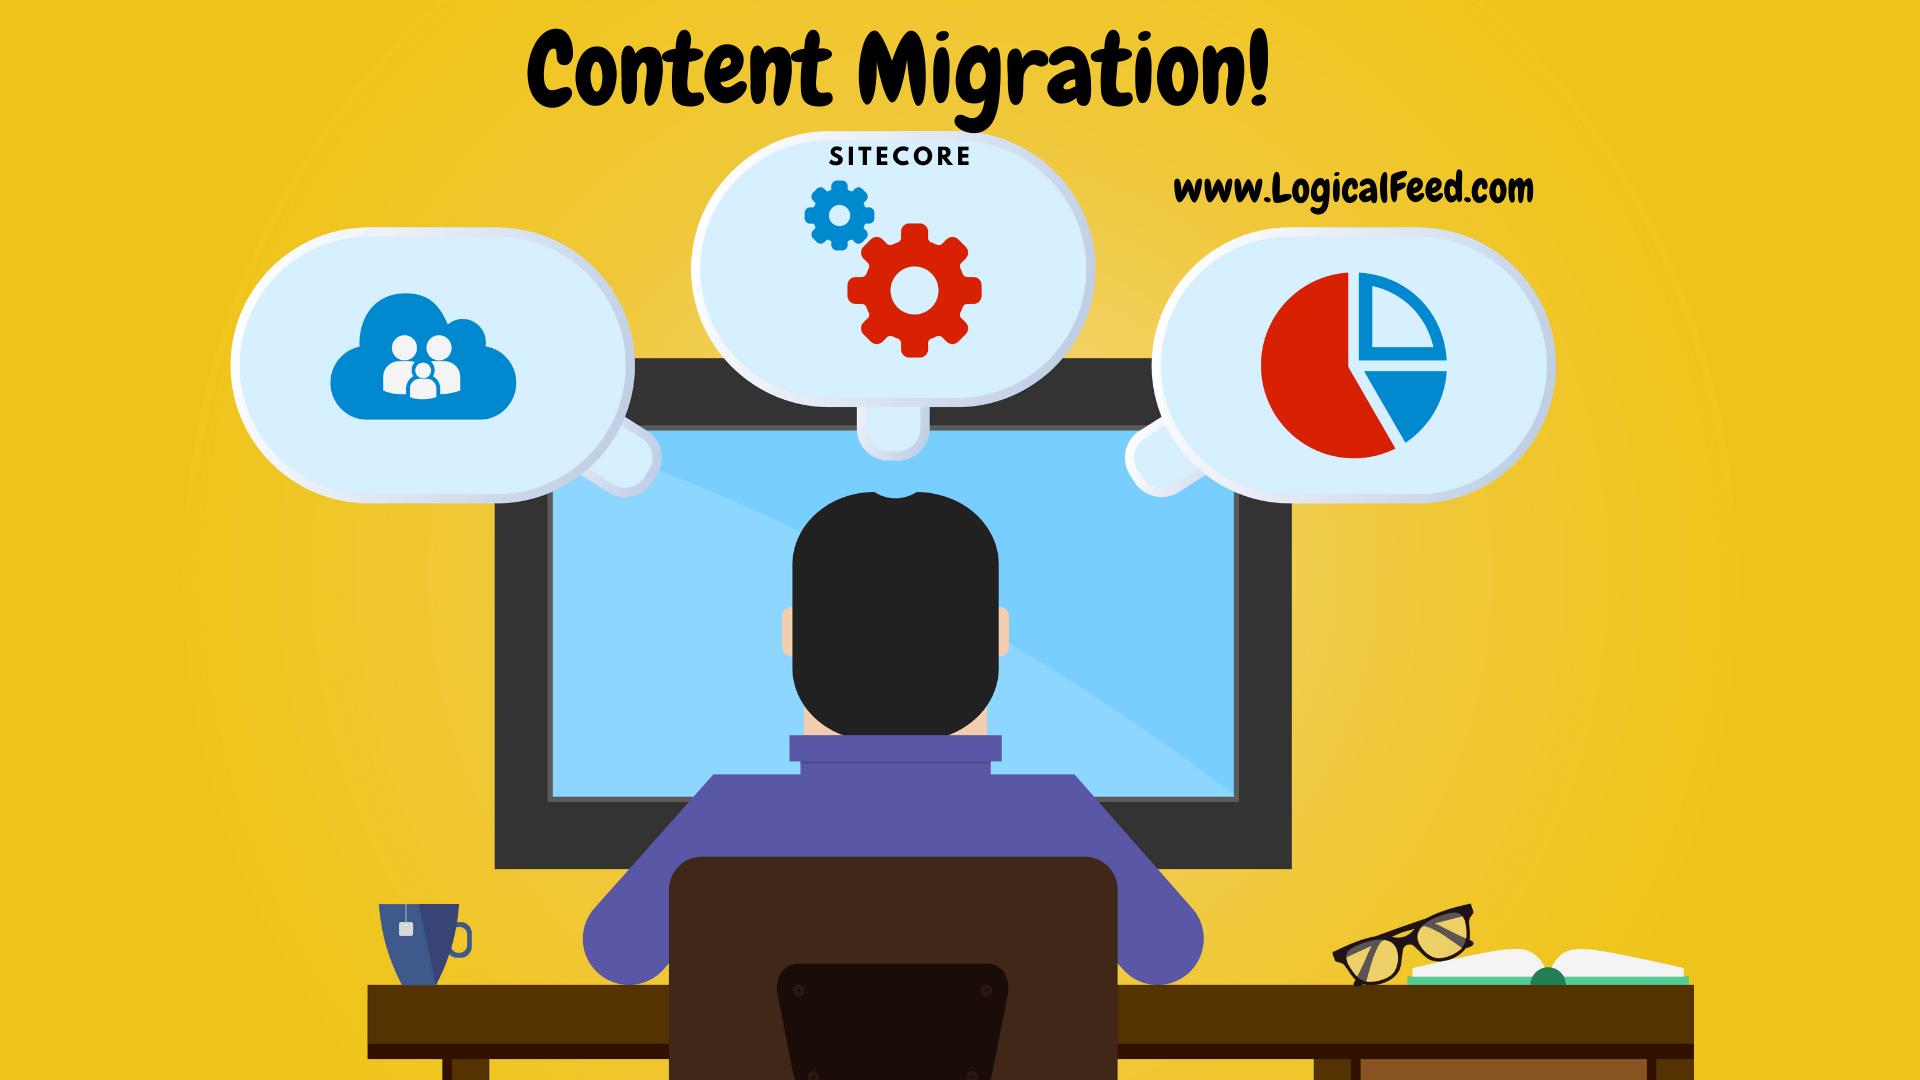 Content migration in Sitecore